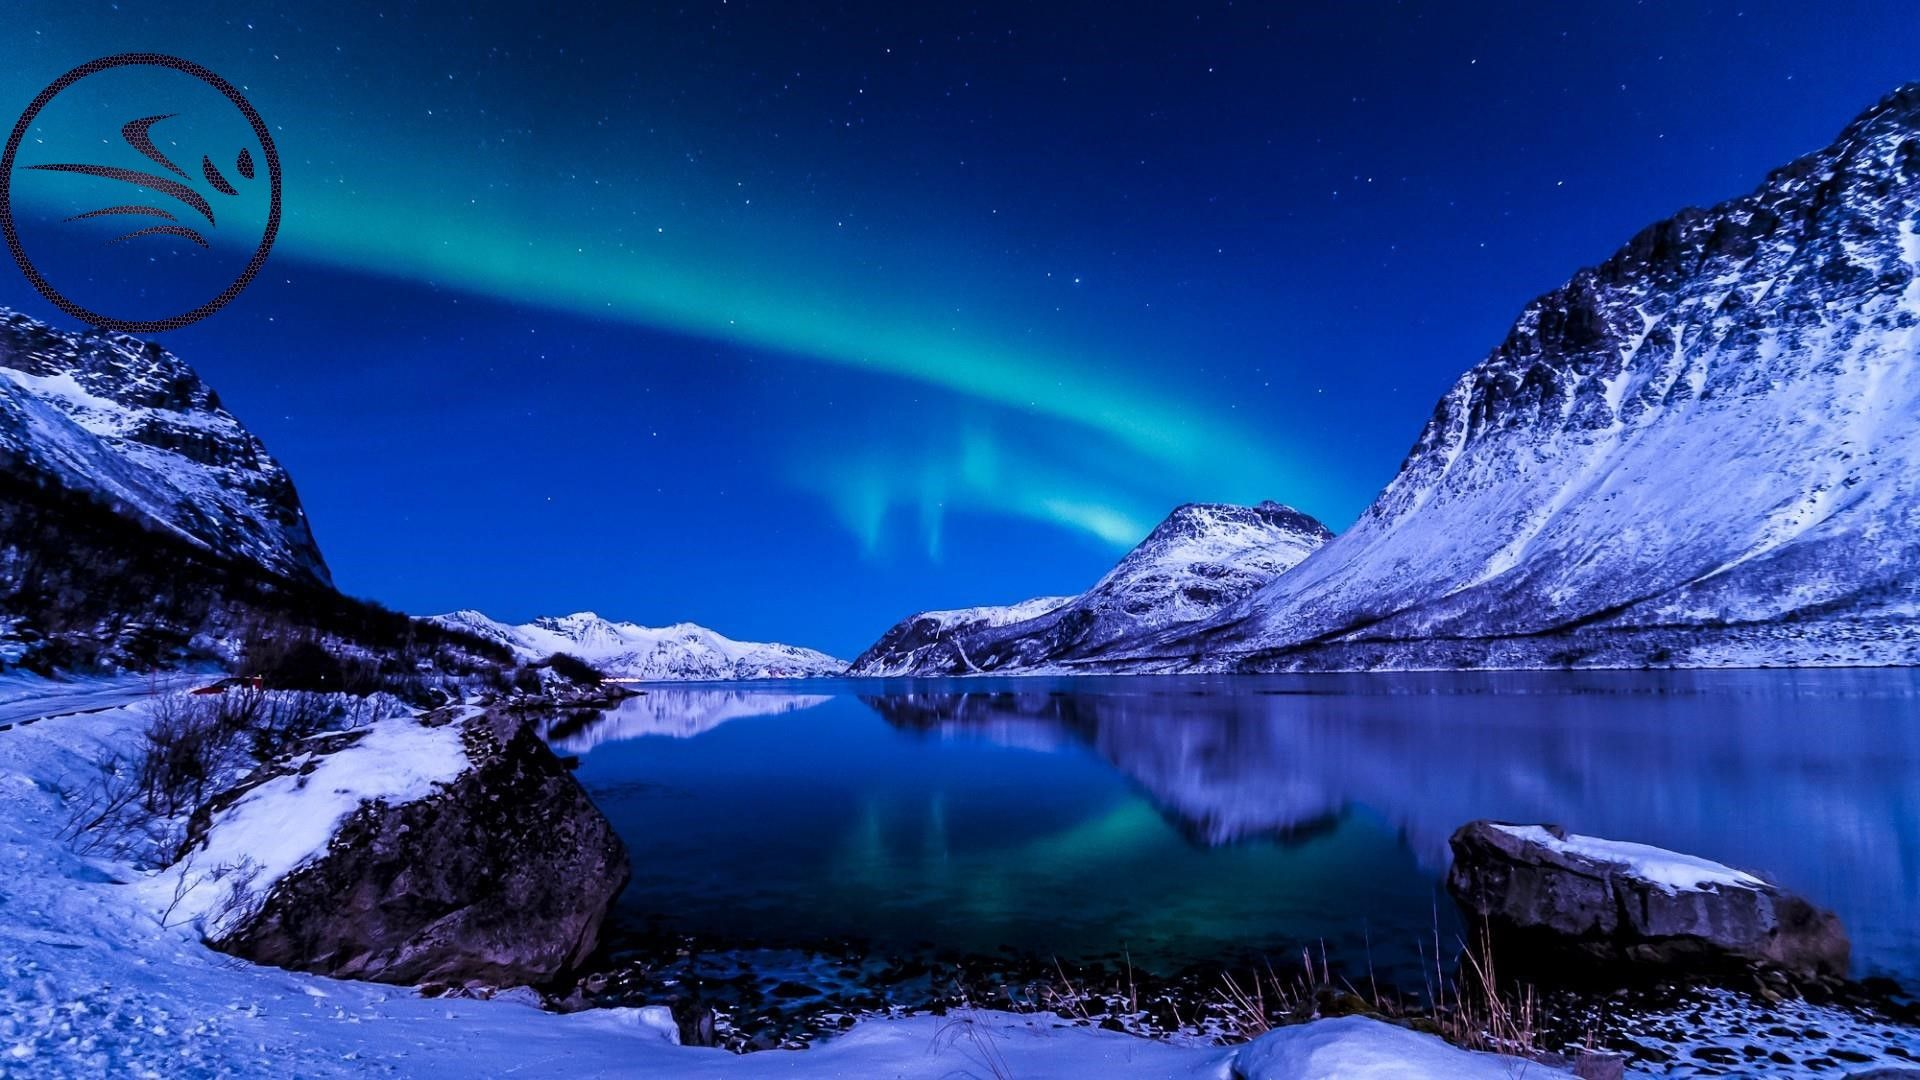 Night Iceland